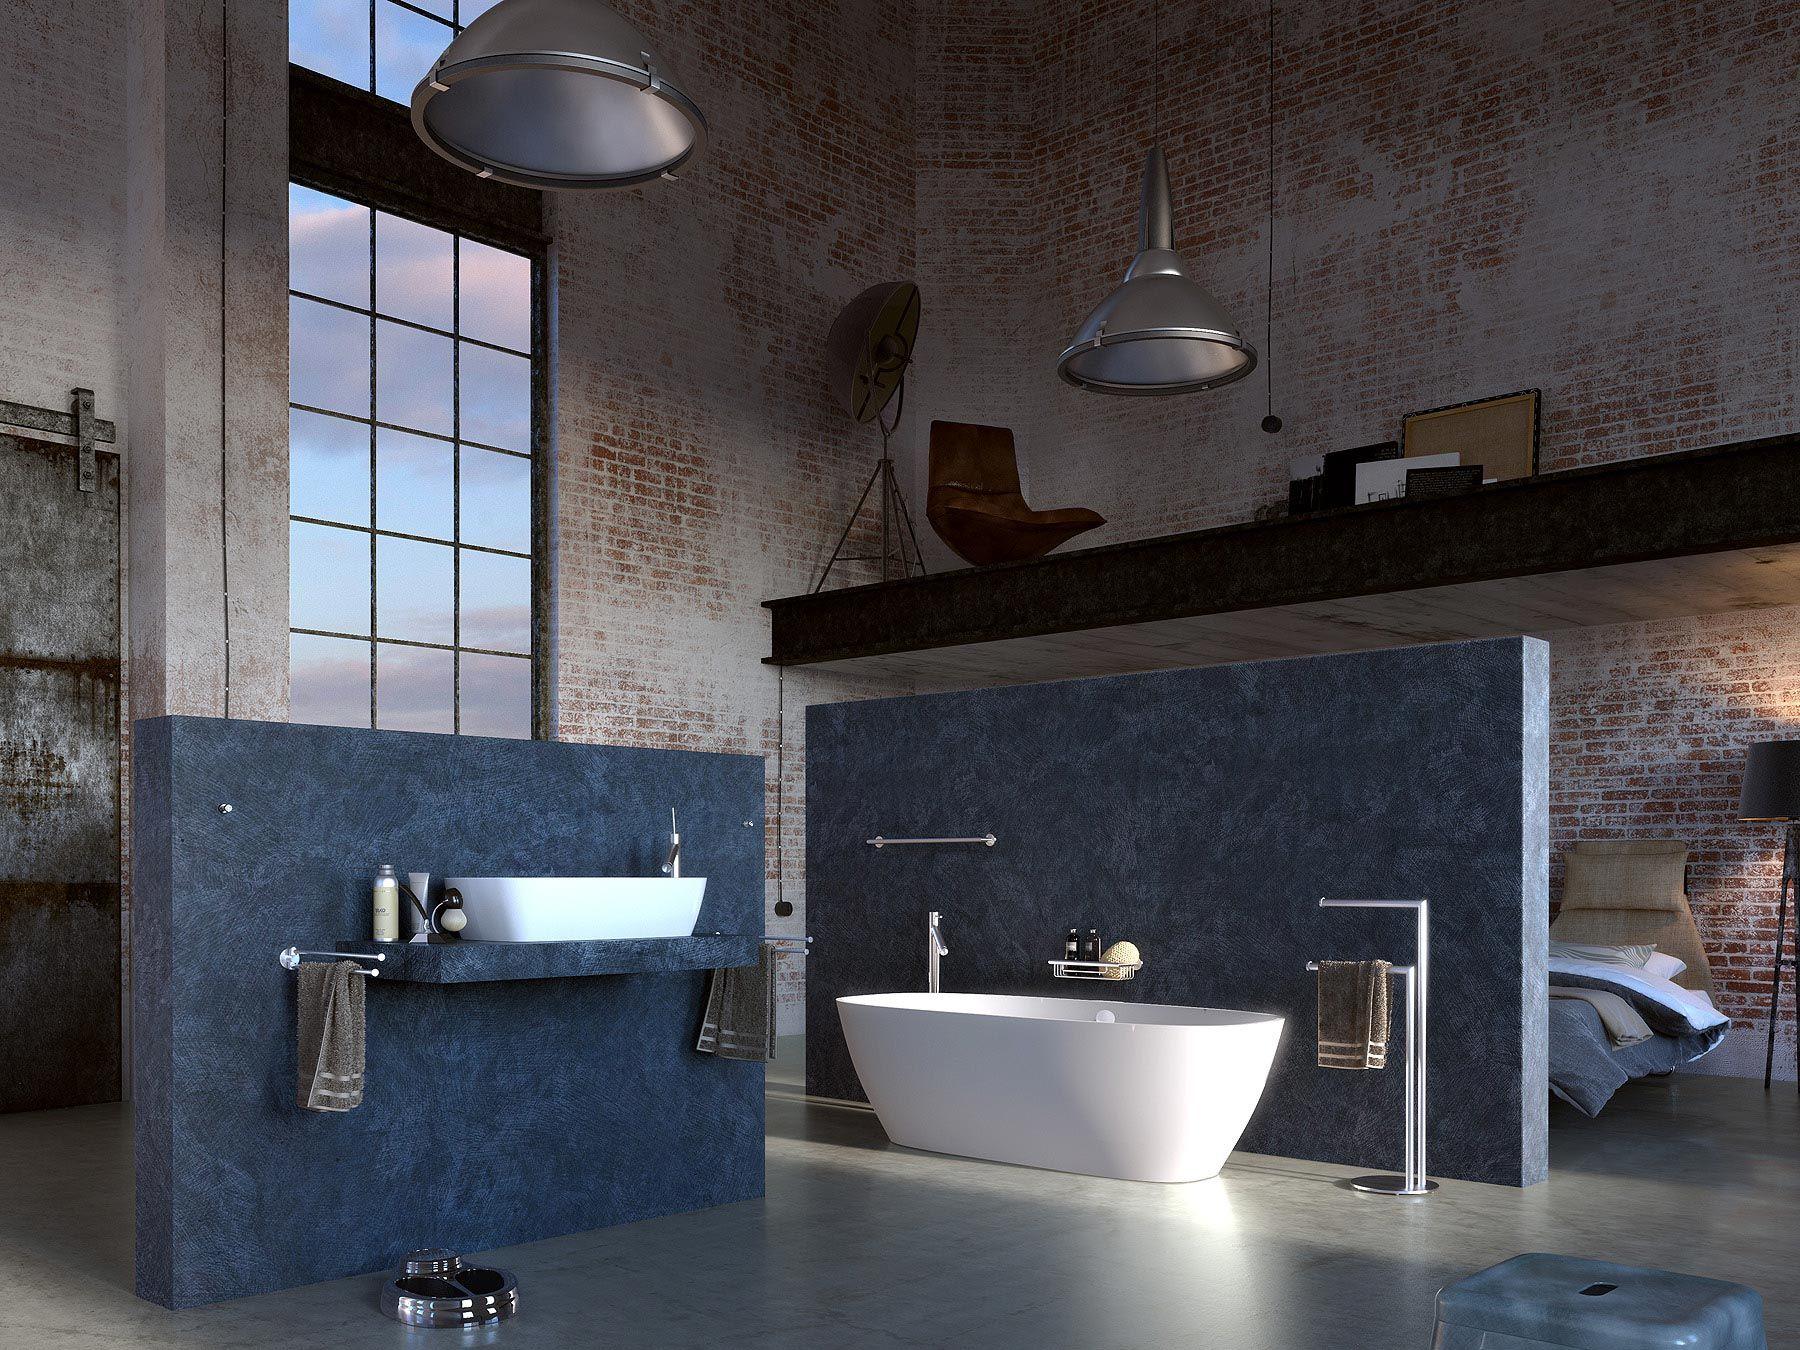 badkamer inspiratie foto s badkamermarkt badkamer